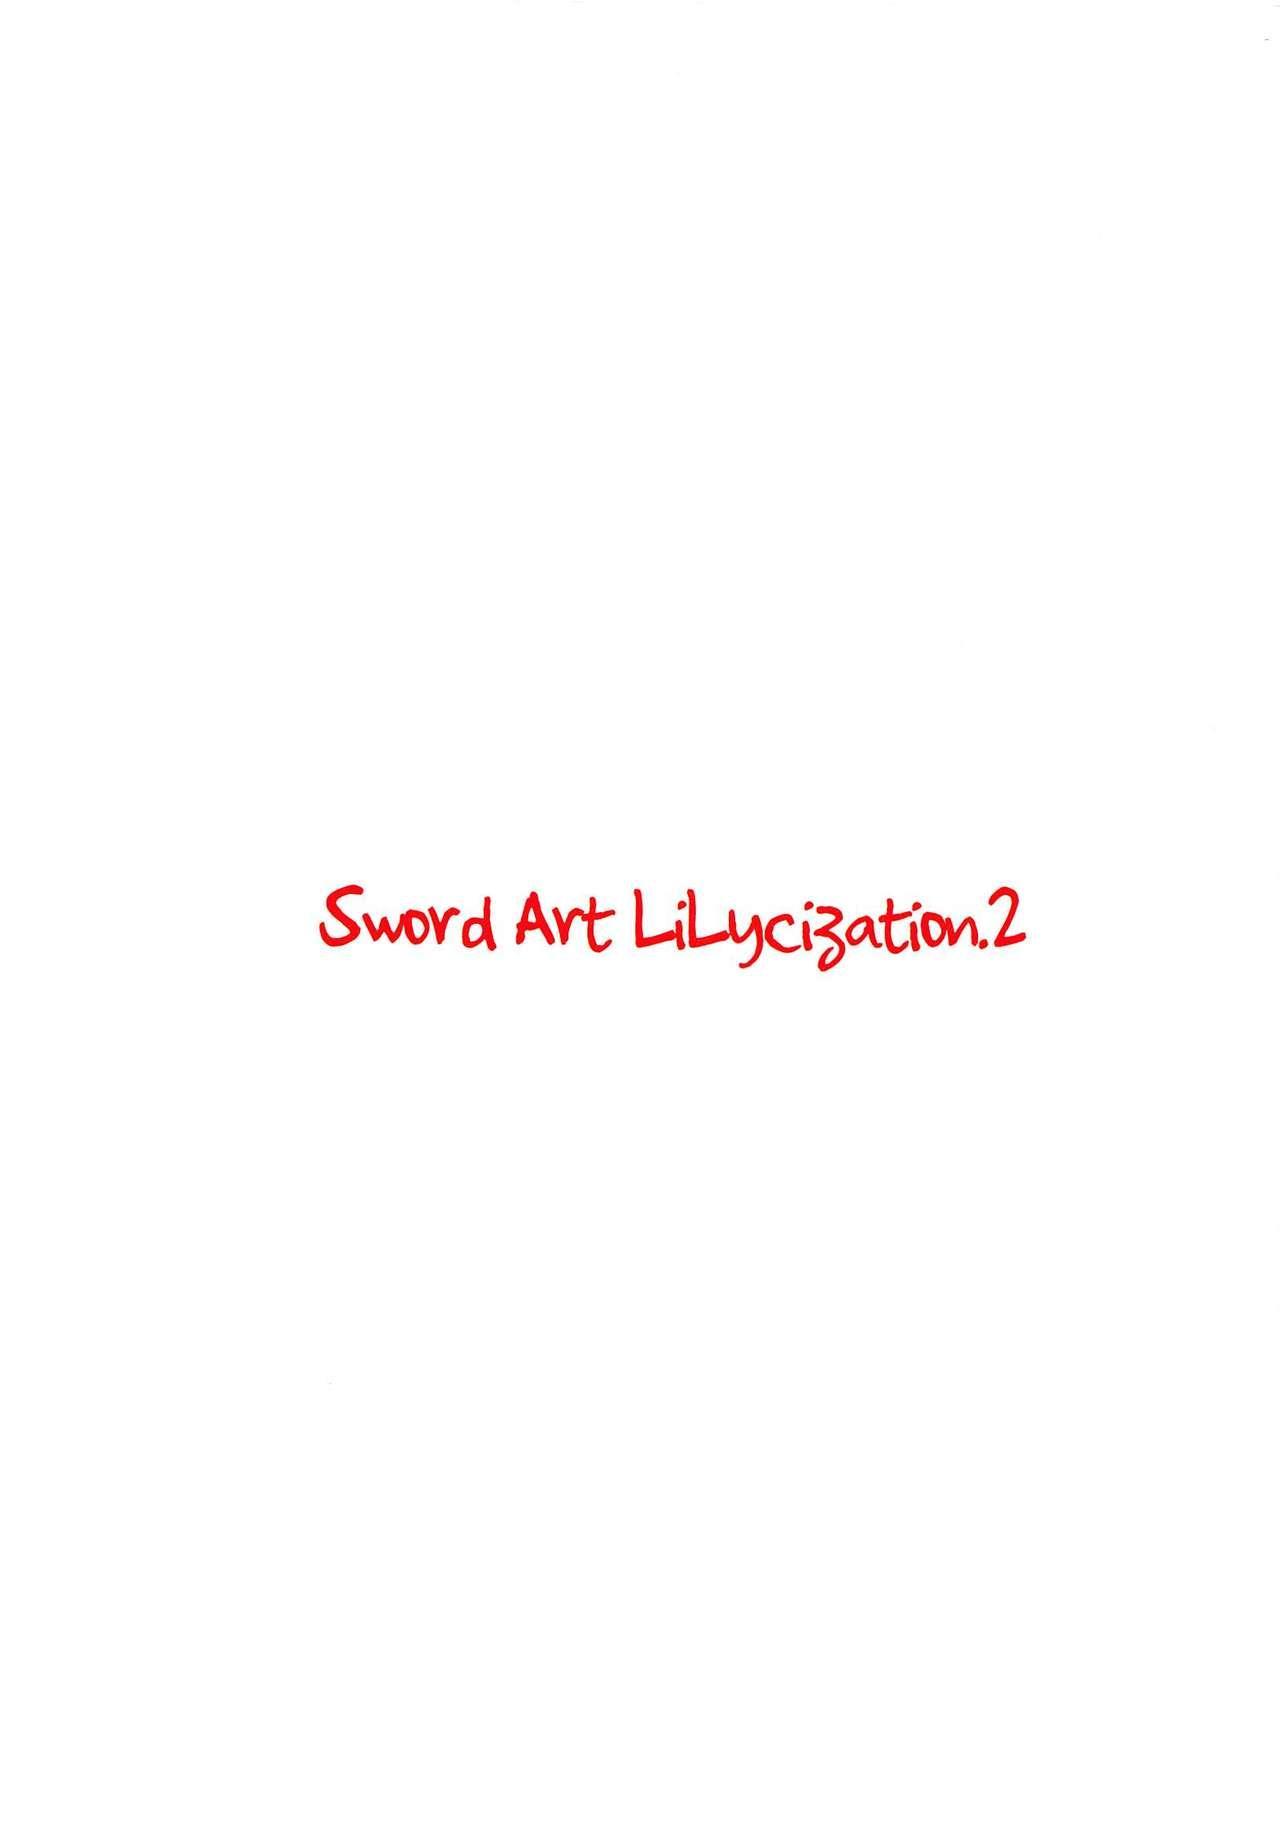 Sword Art Lilycization.2 1